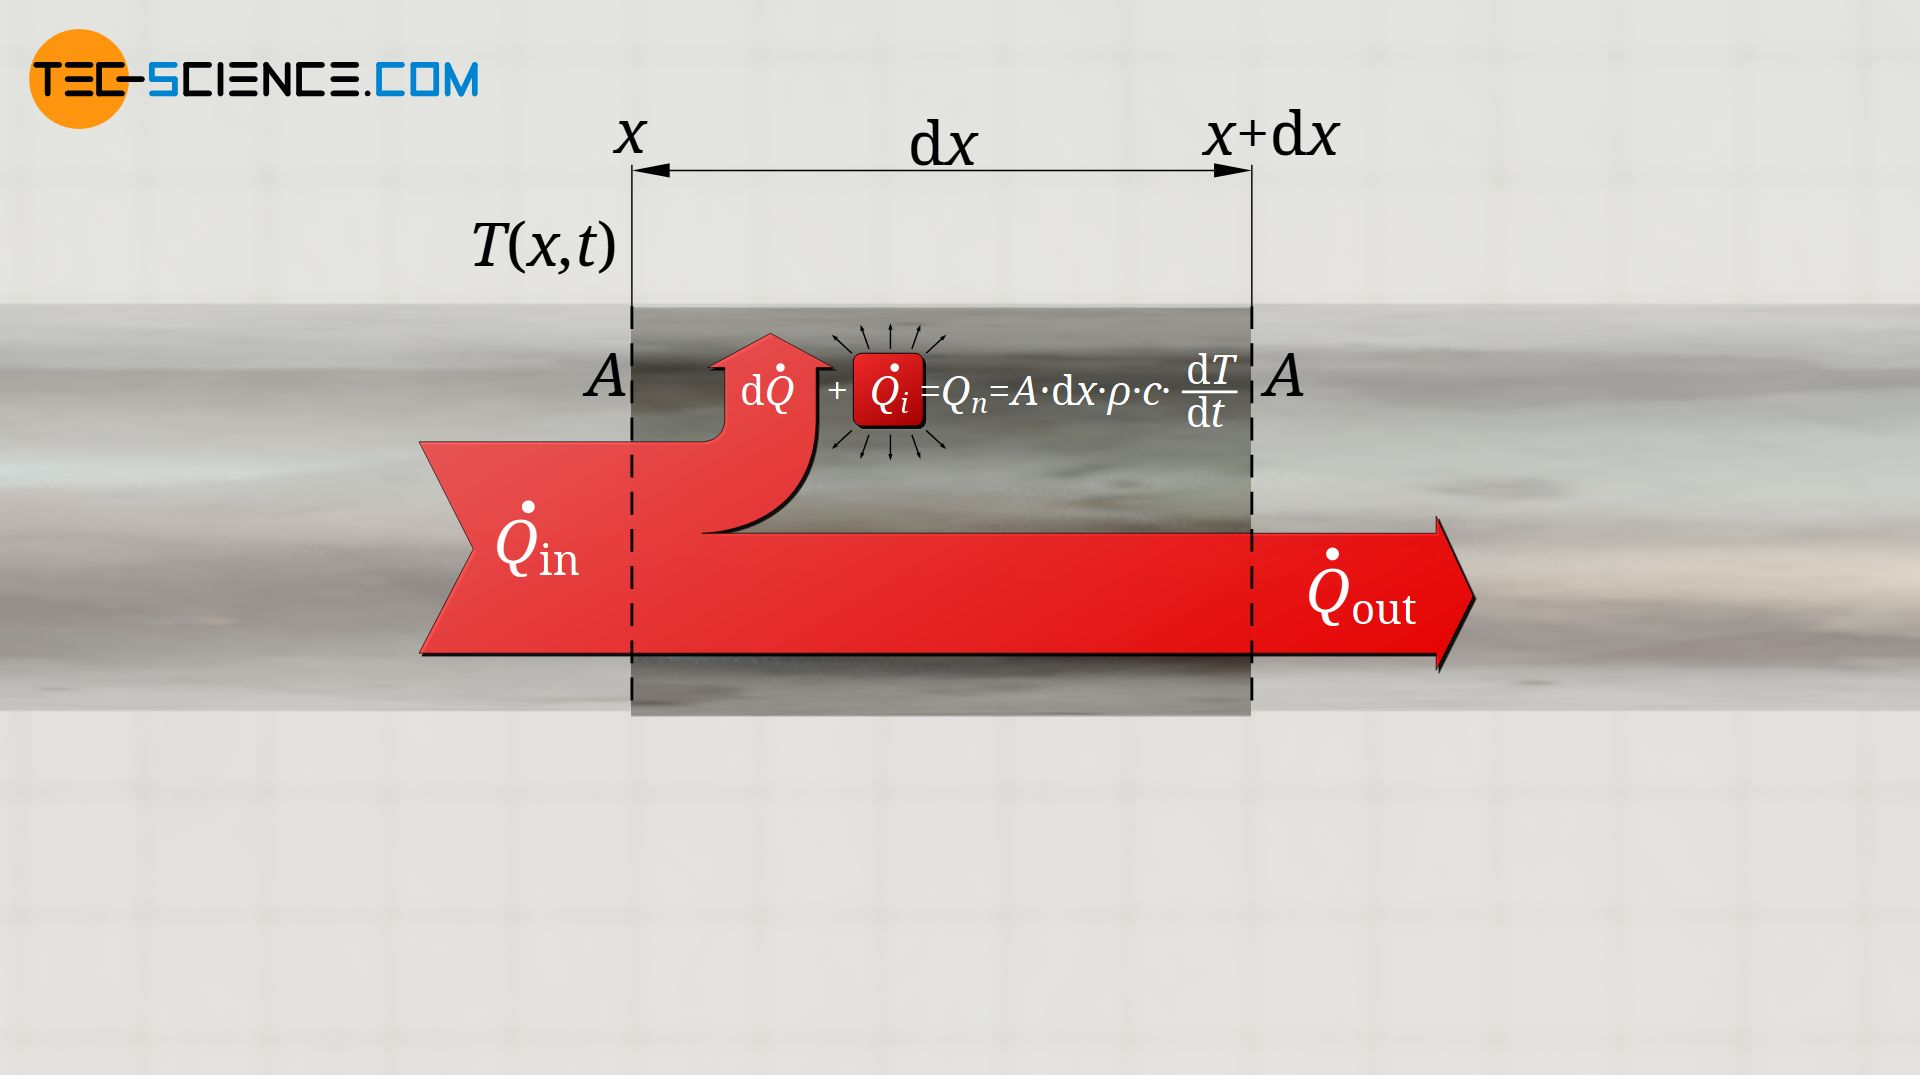 Heat equation with internal heat generation